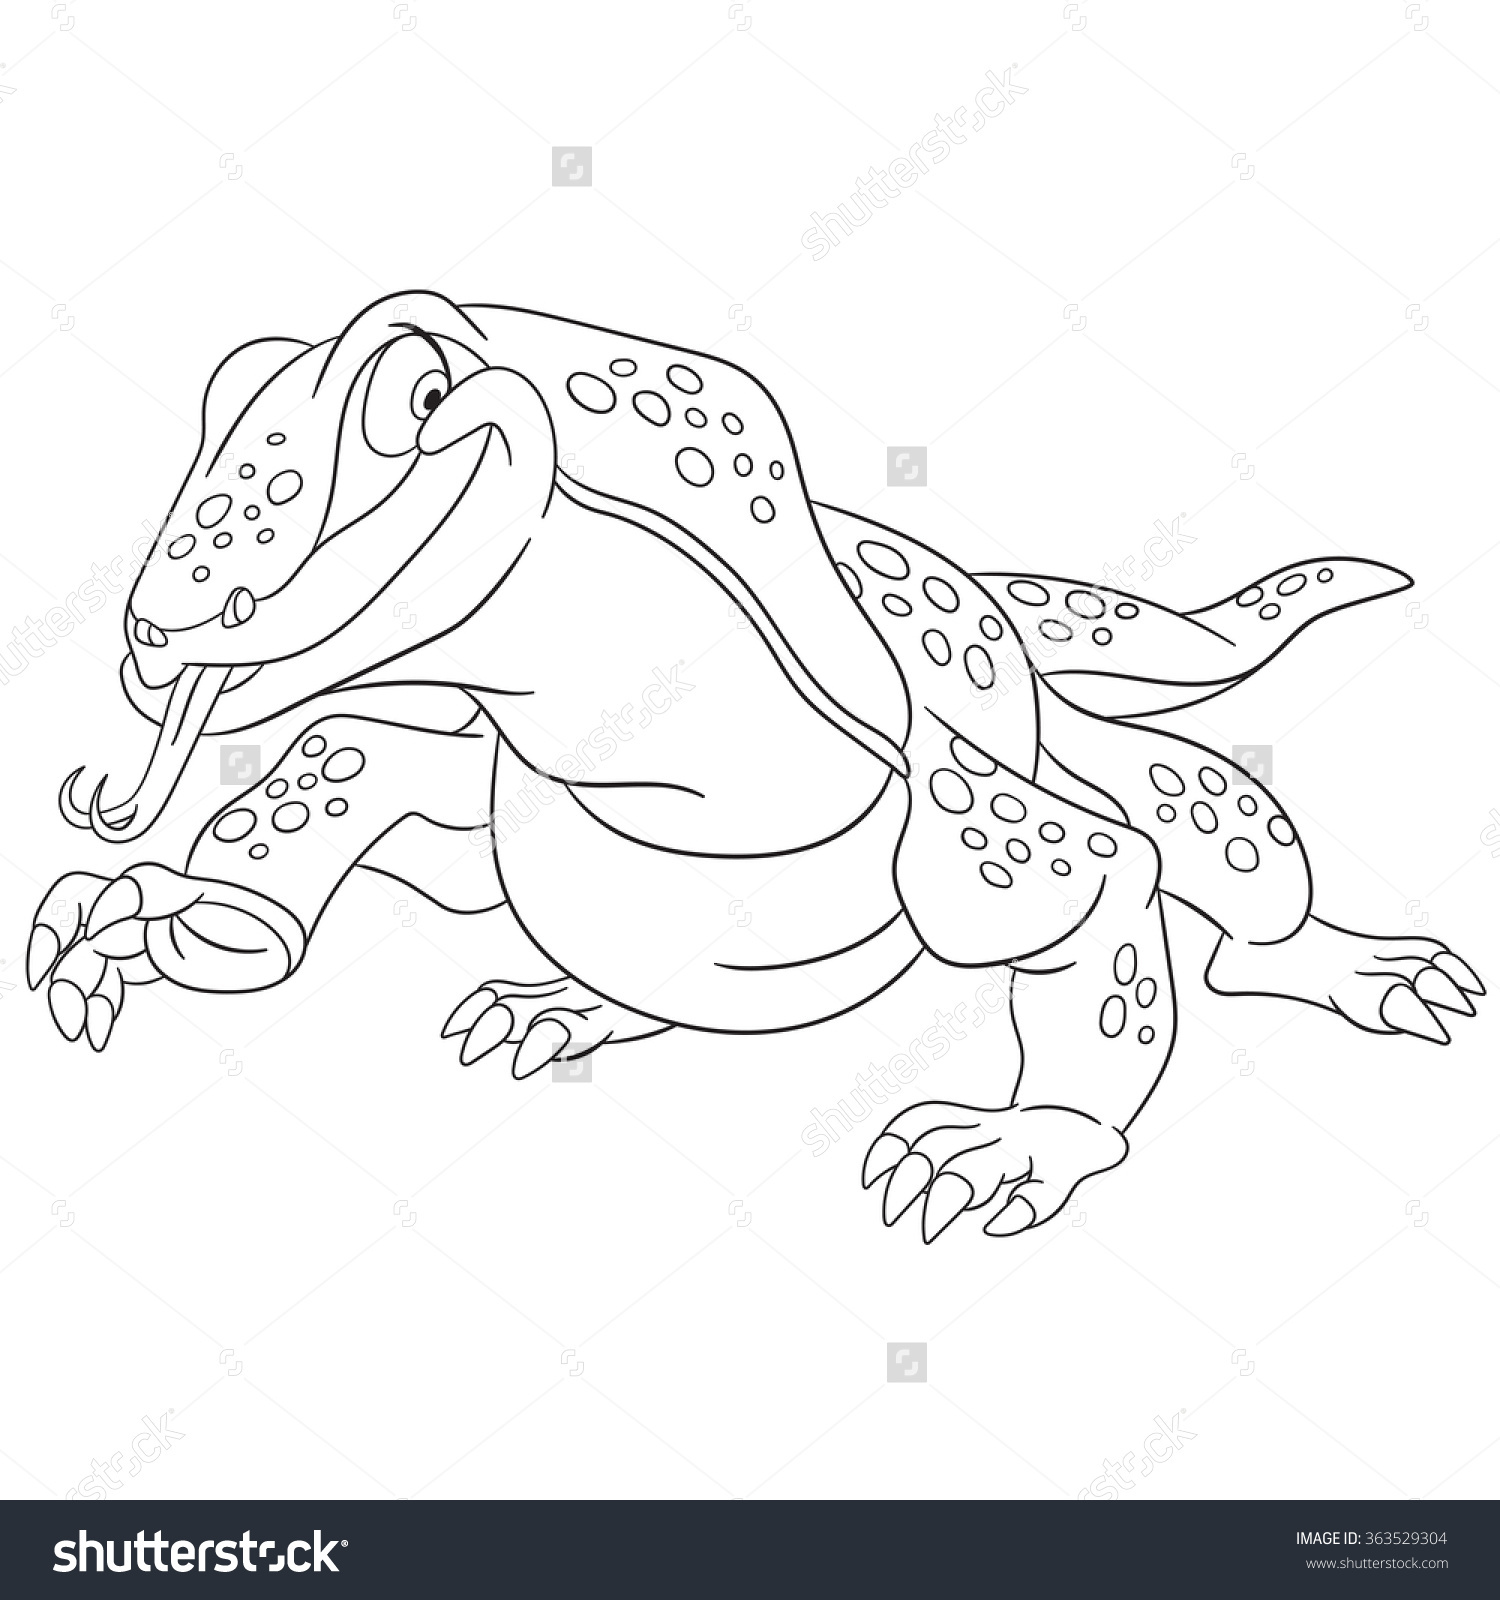 Komodo Dragon Head Clipart Black And White